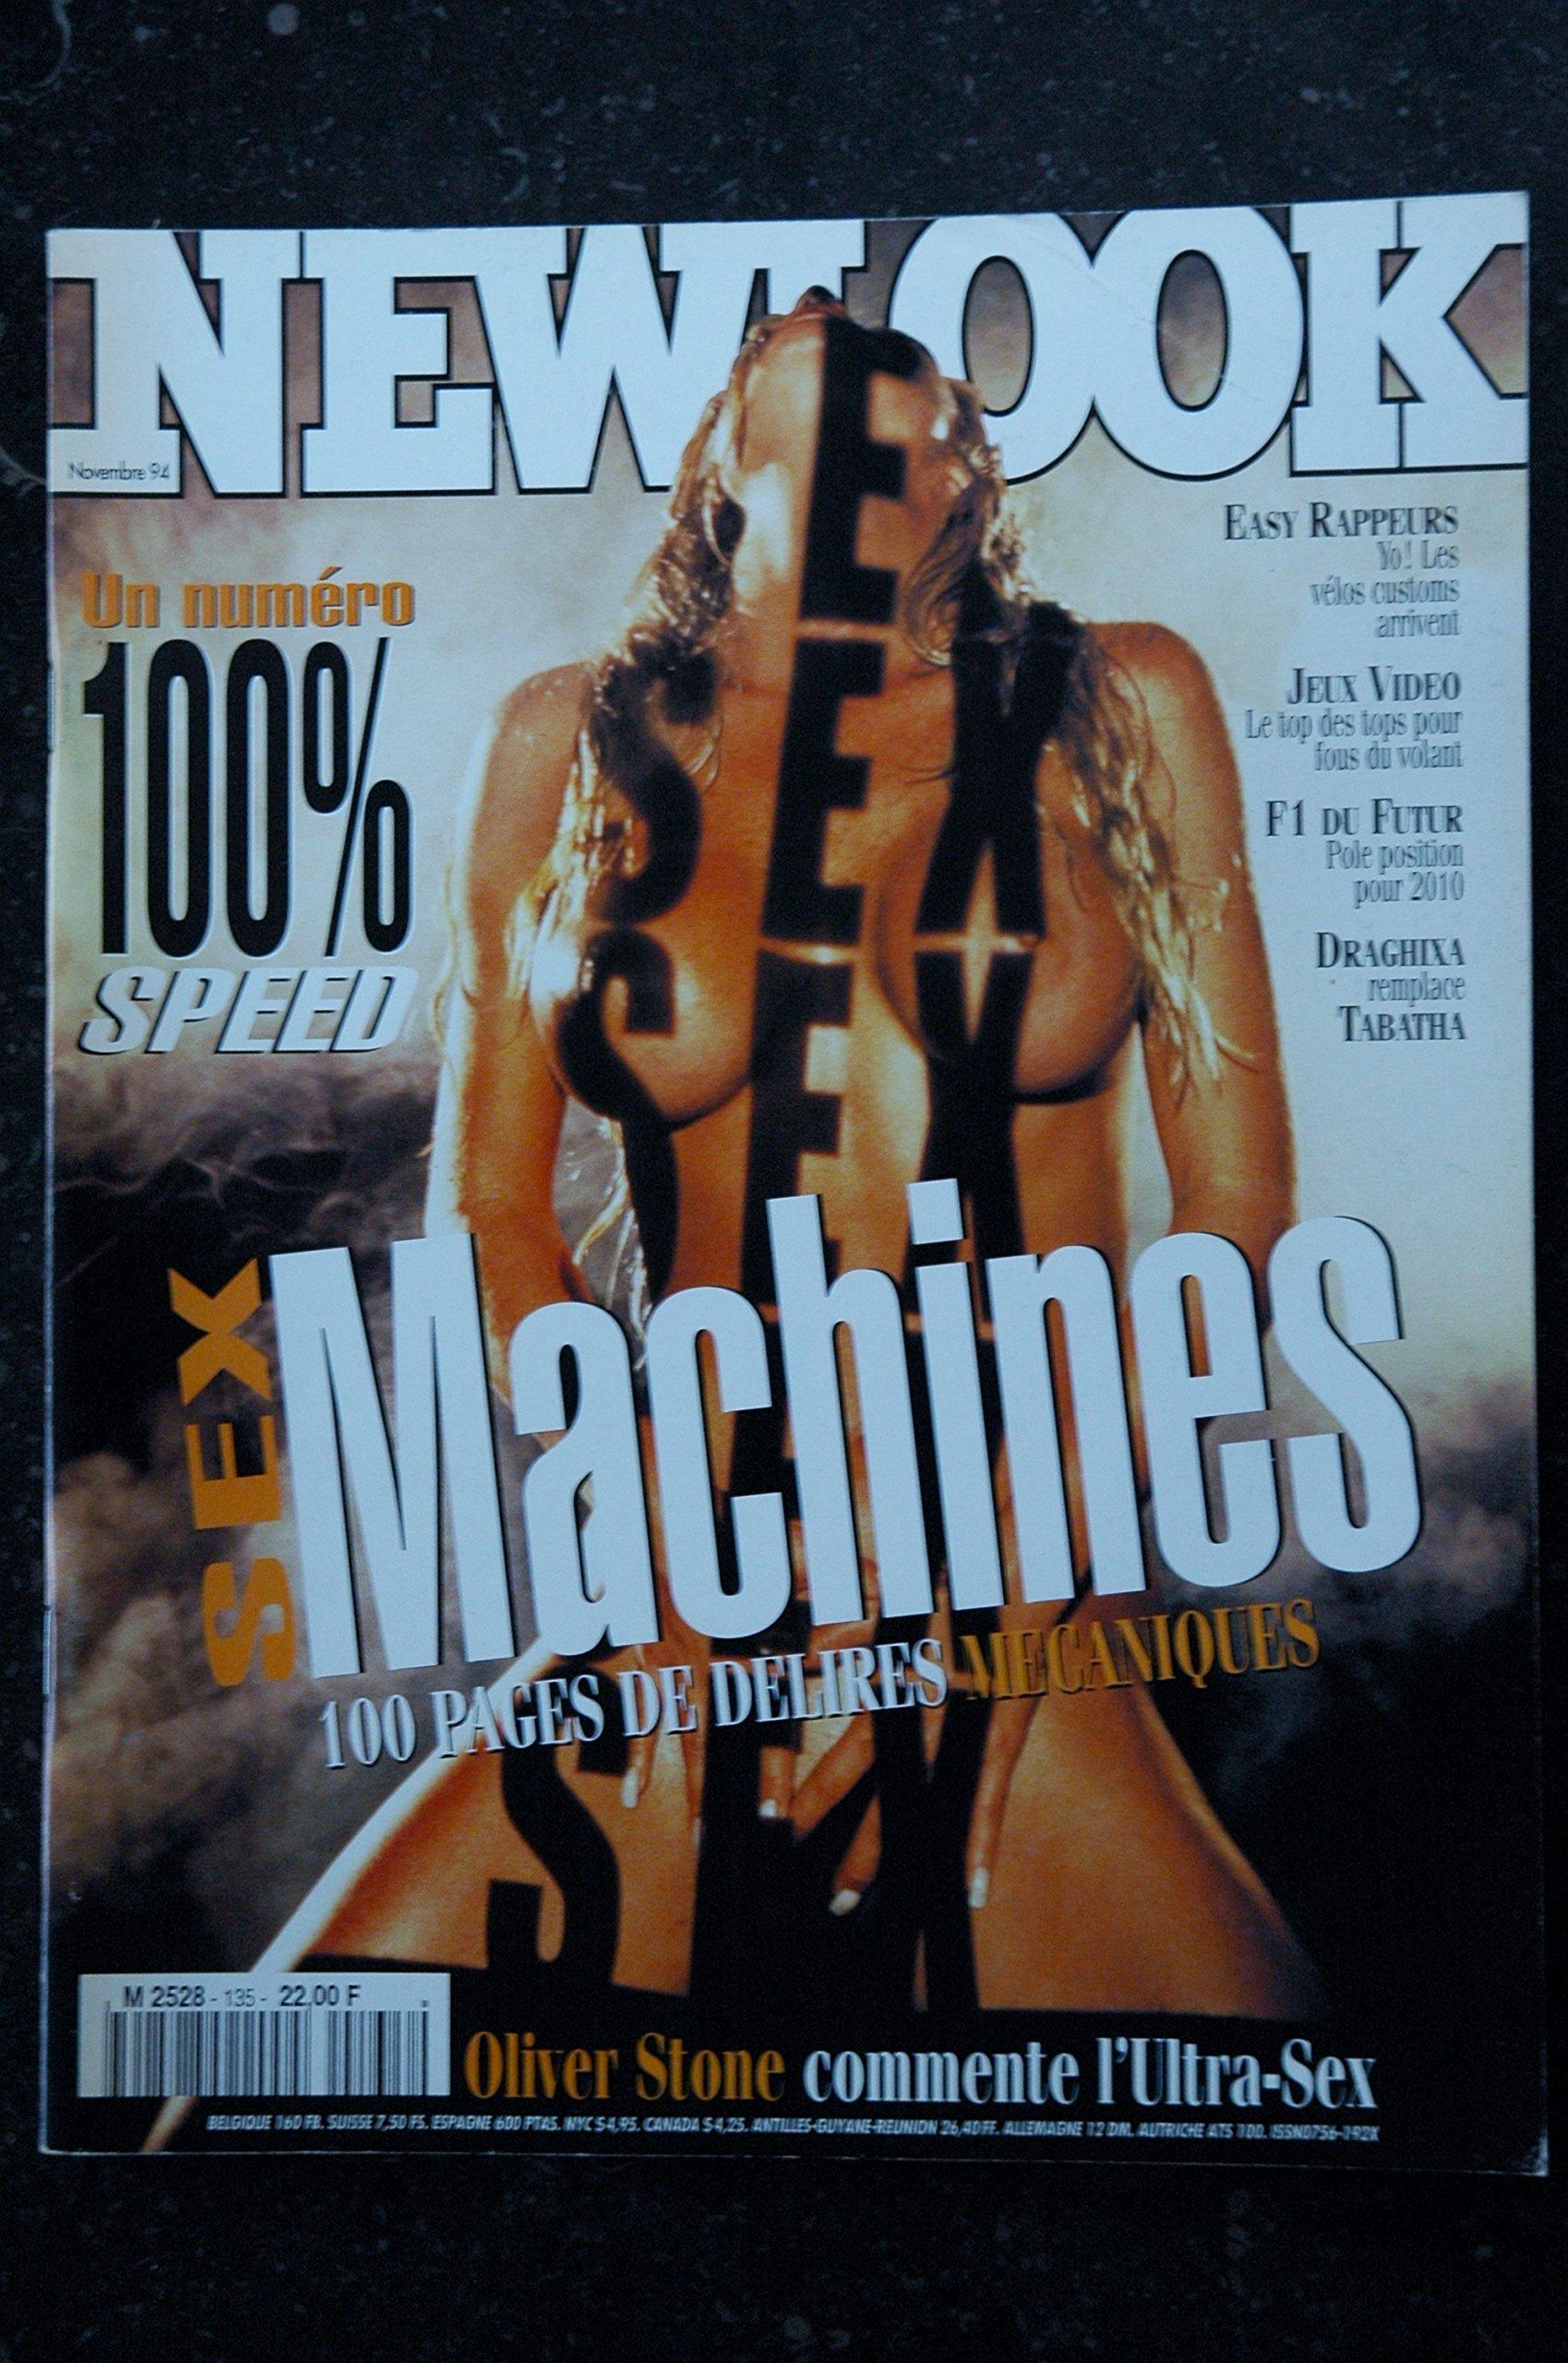 NEWLOOK 135 HARLEY STEPHEN HICKS DRAGHIXA ENTIEREMENT NUE GIRLS NUDES J.  RUTTER Single Issue Magazine – October 31, 1994